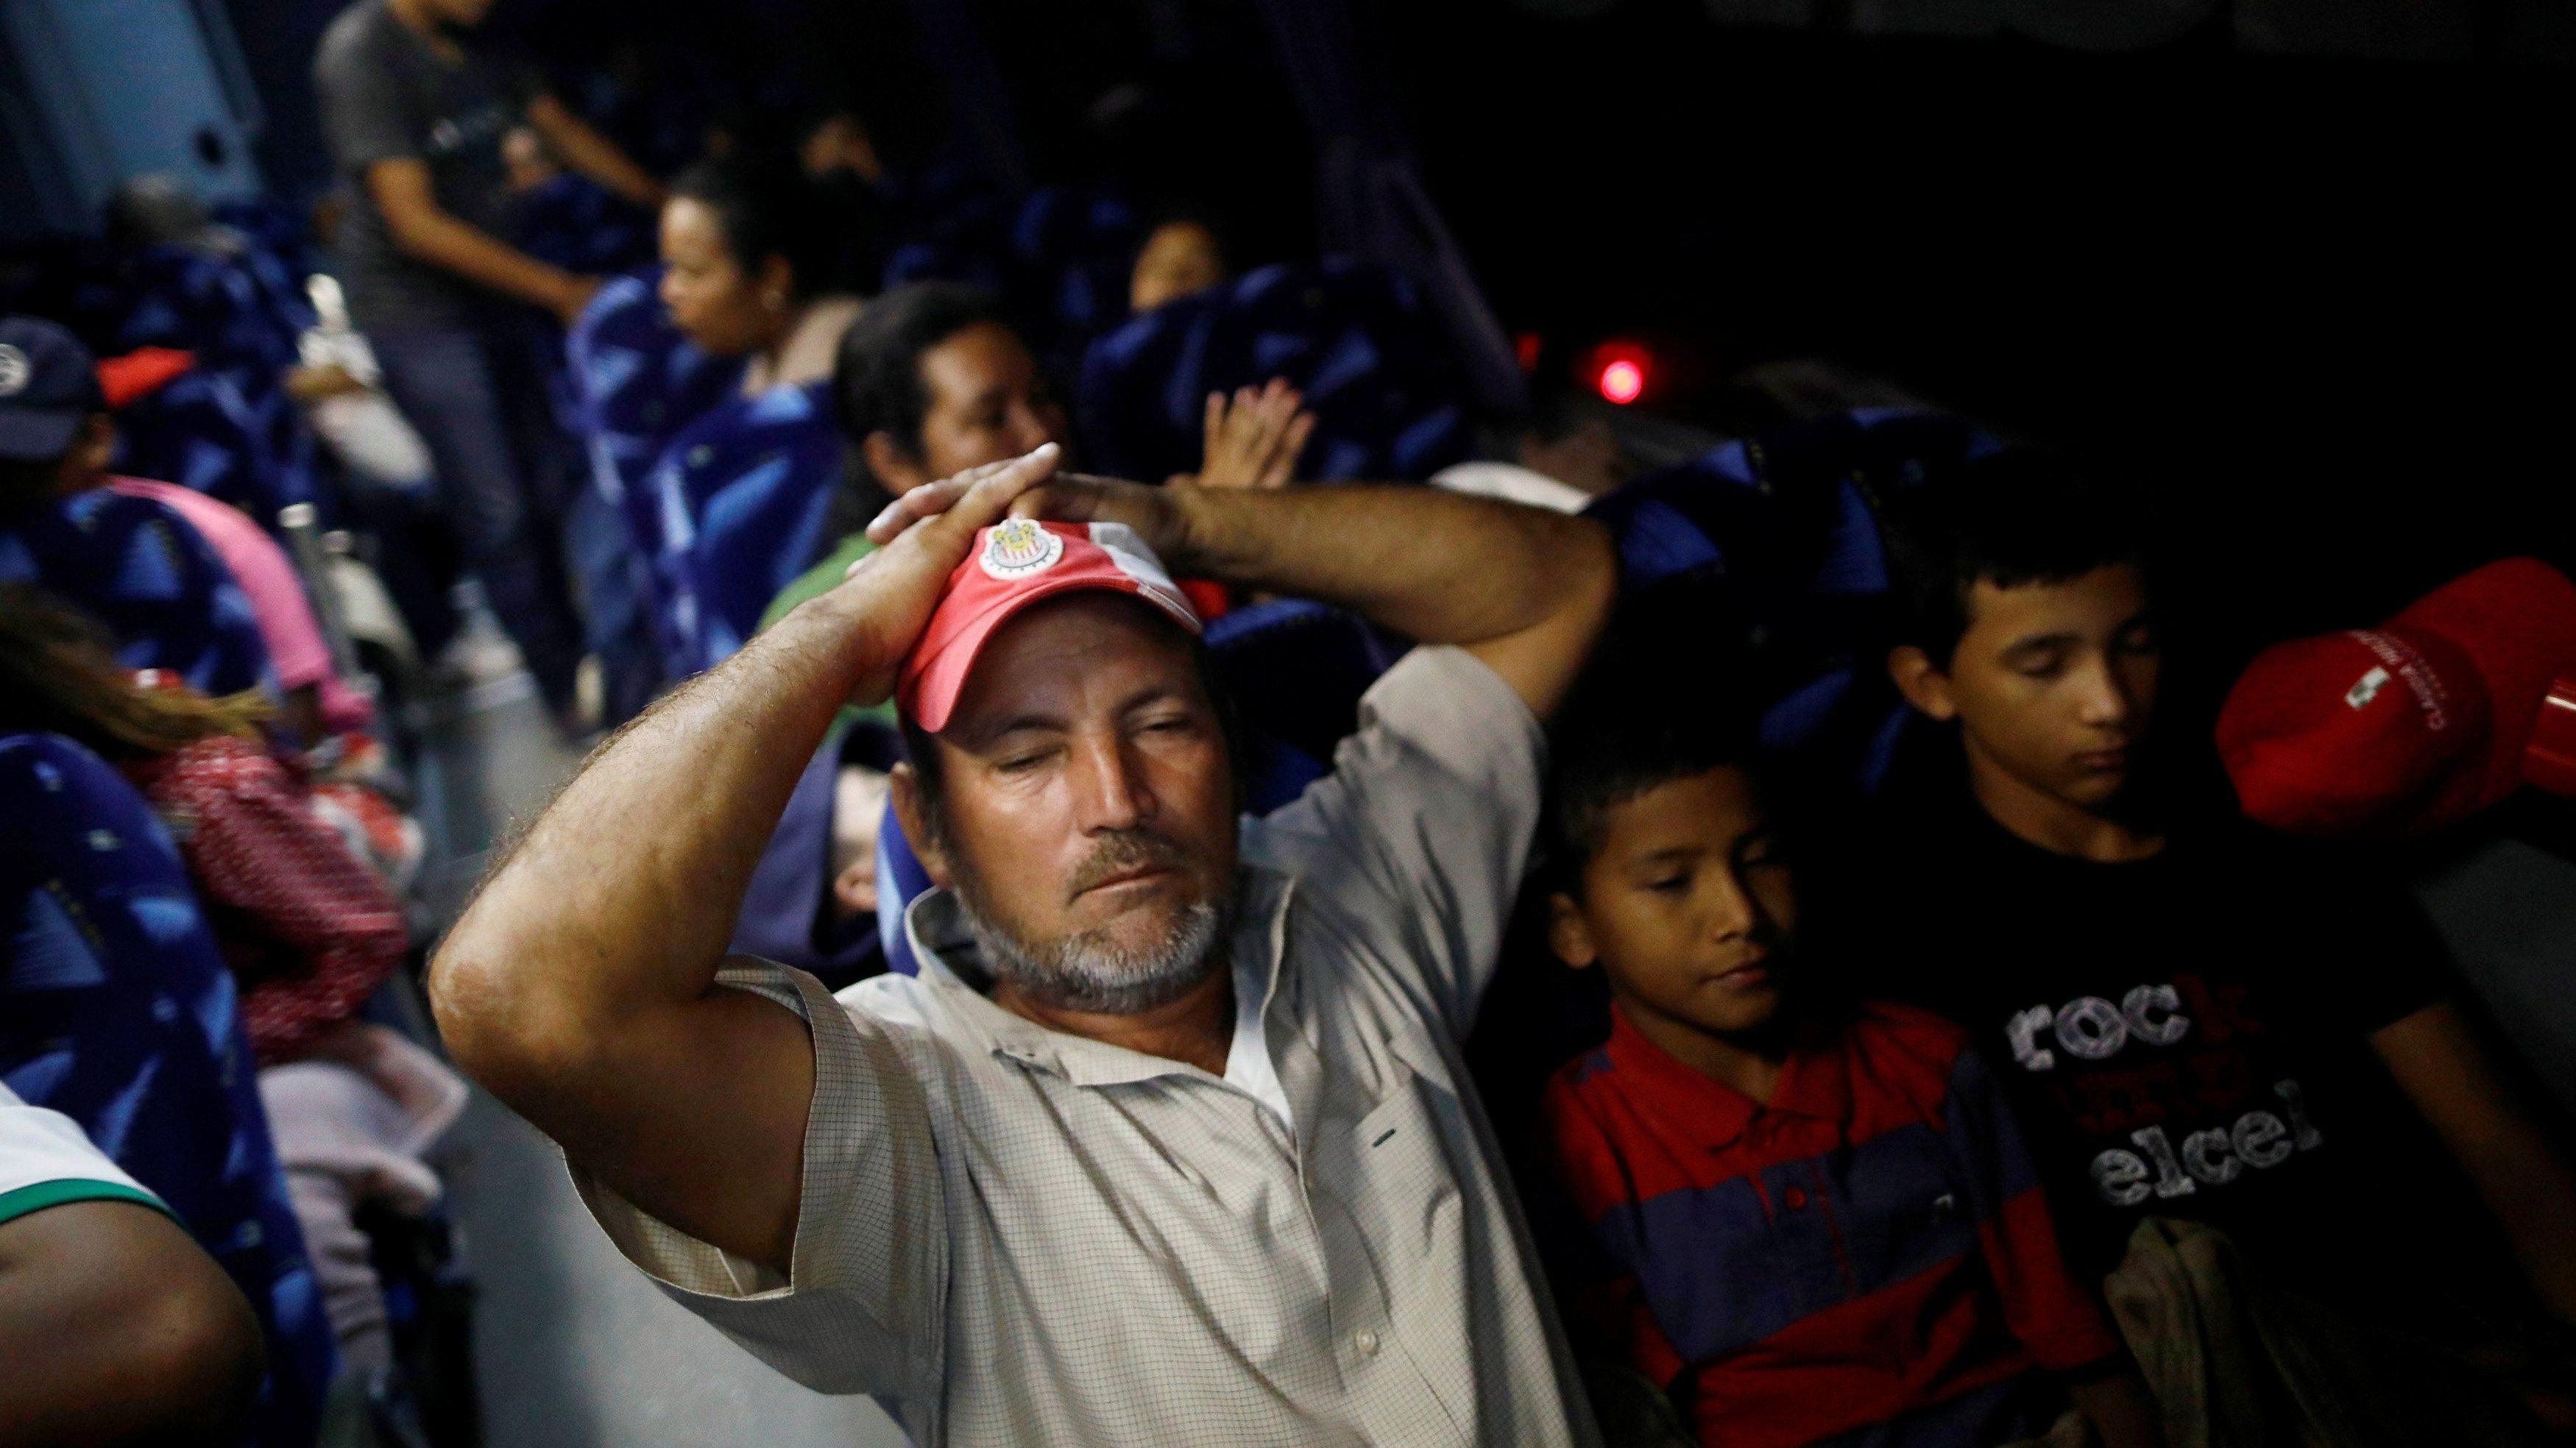 A Central American migrant, moving in a caravan through Mexico